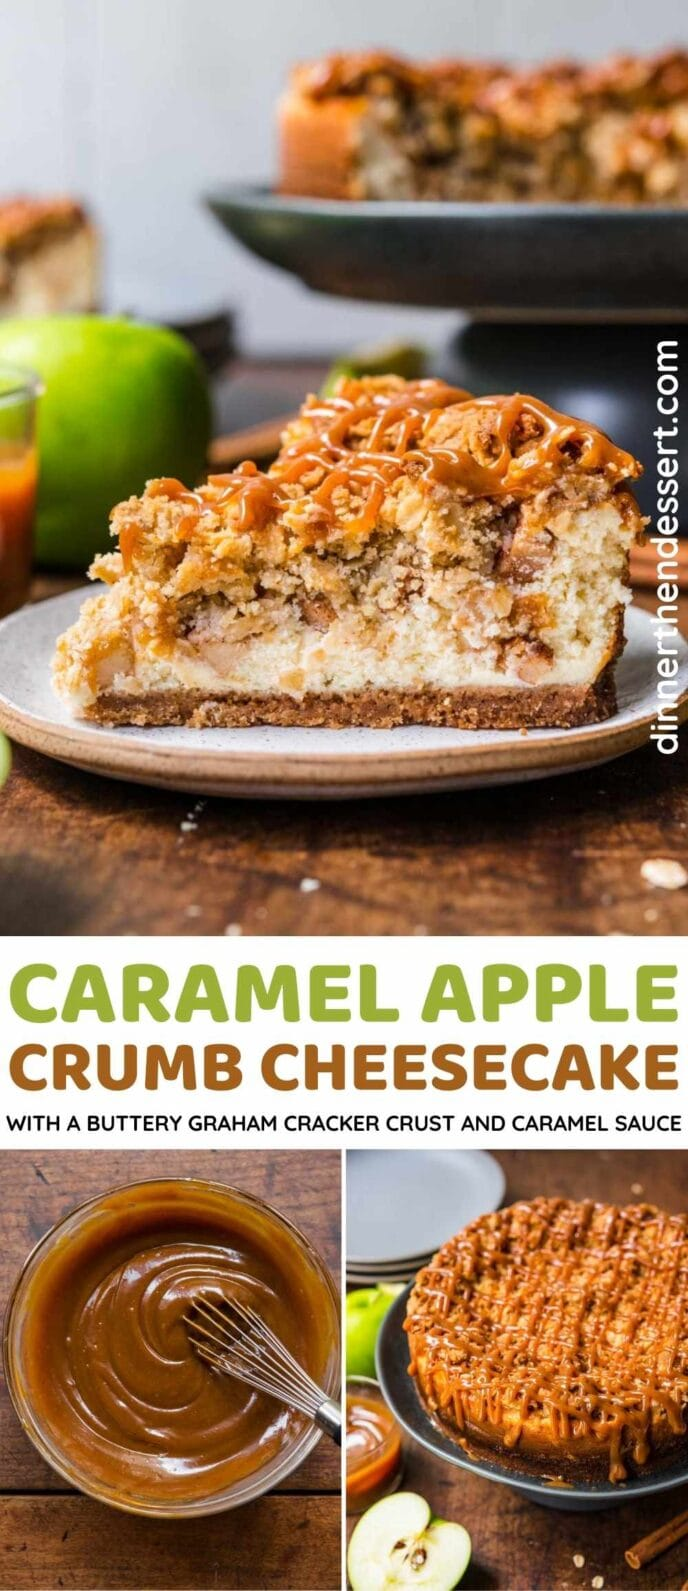 Caramel Apple Crumb Cheesecake Collage